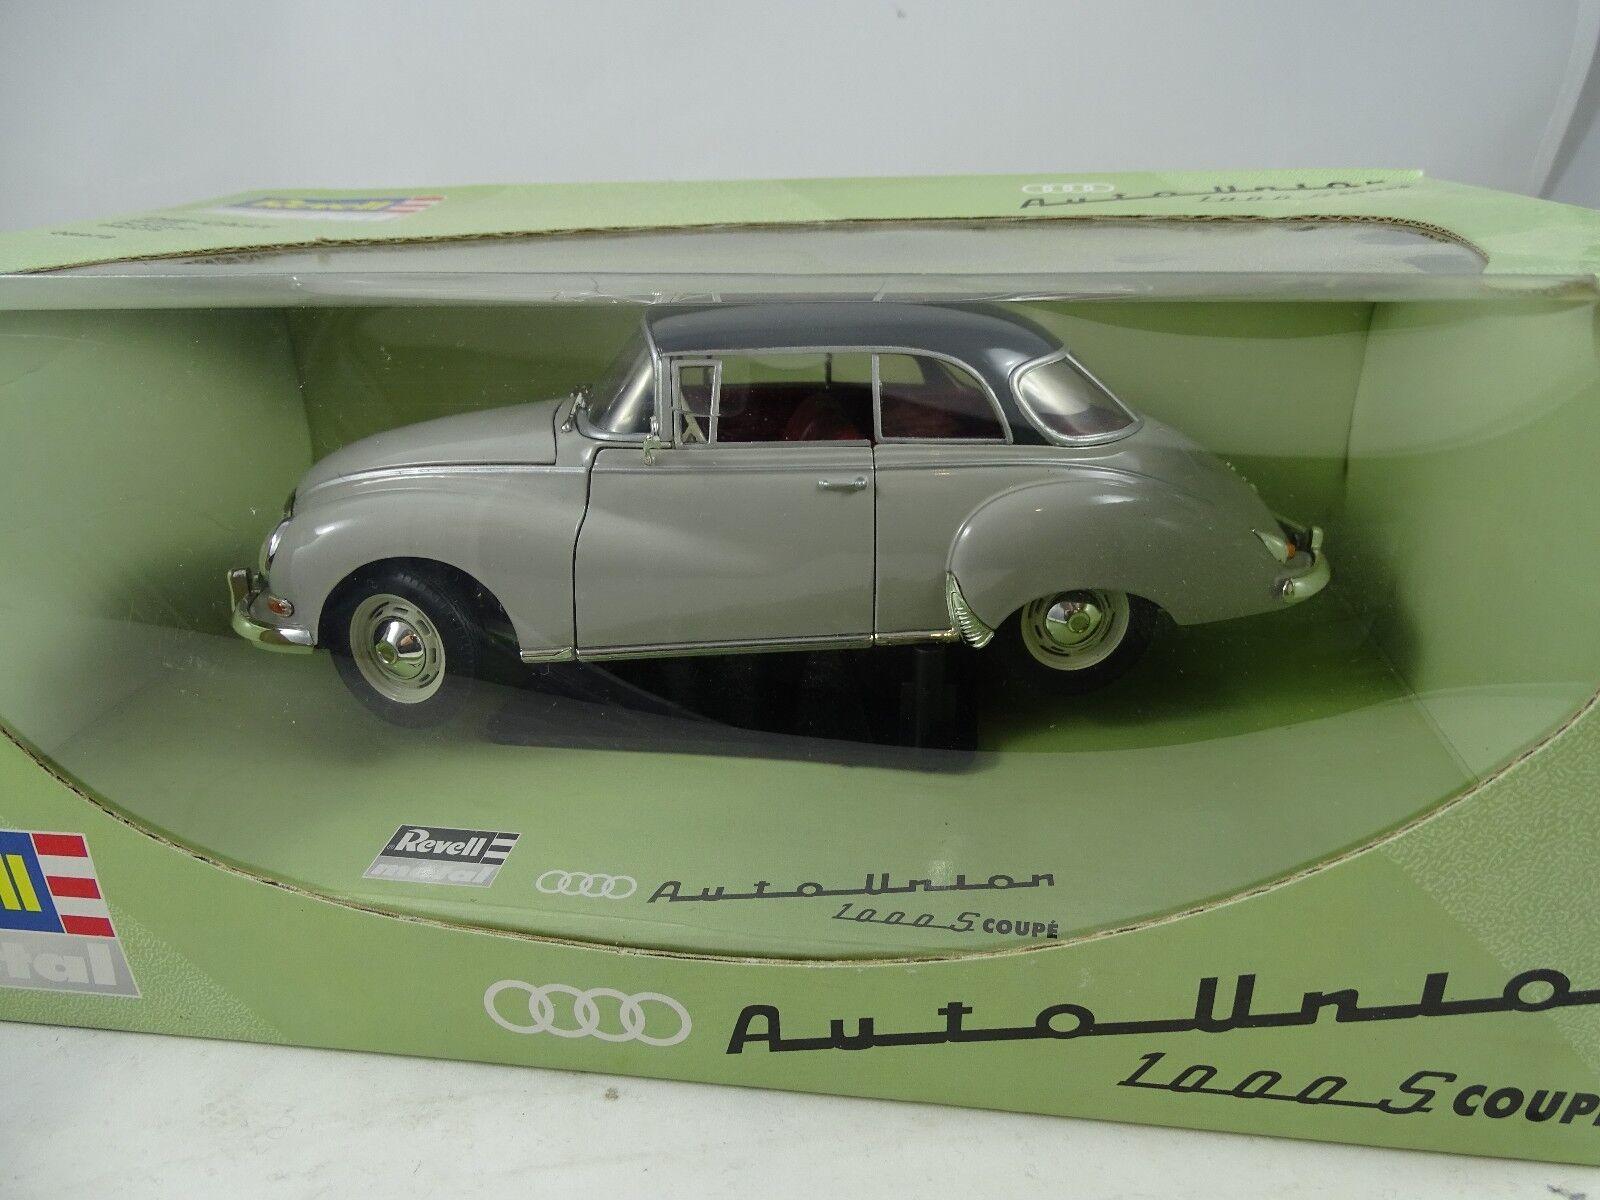 1 18 Revell Auto Union 1000 5 Coupe Cream Rarity §